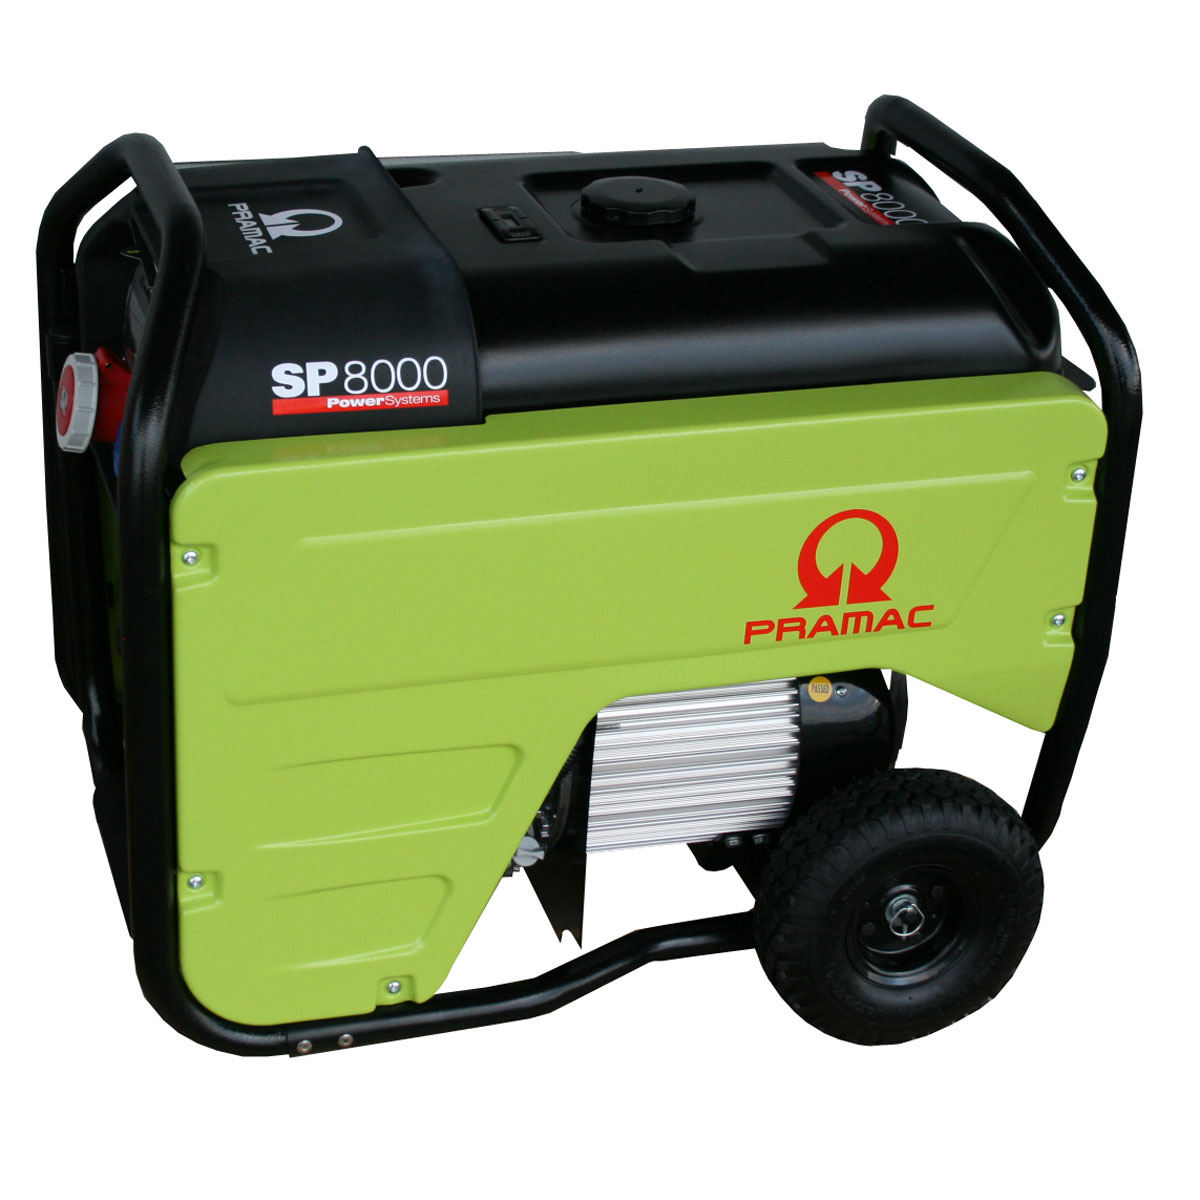 stromerzeuger benzin pramac: stromerzeuger pramac sp8000 thb